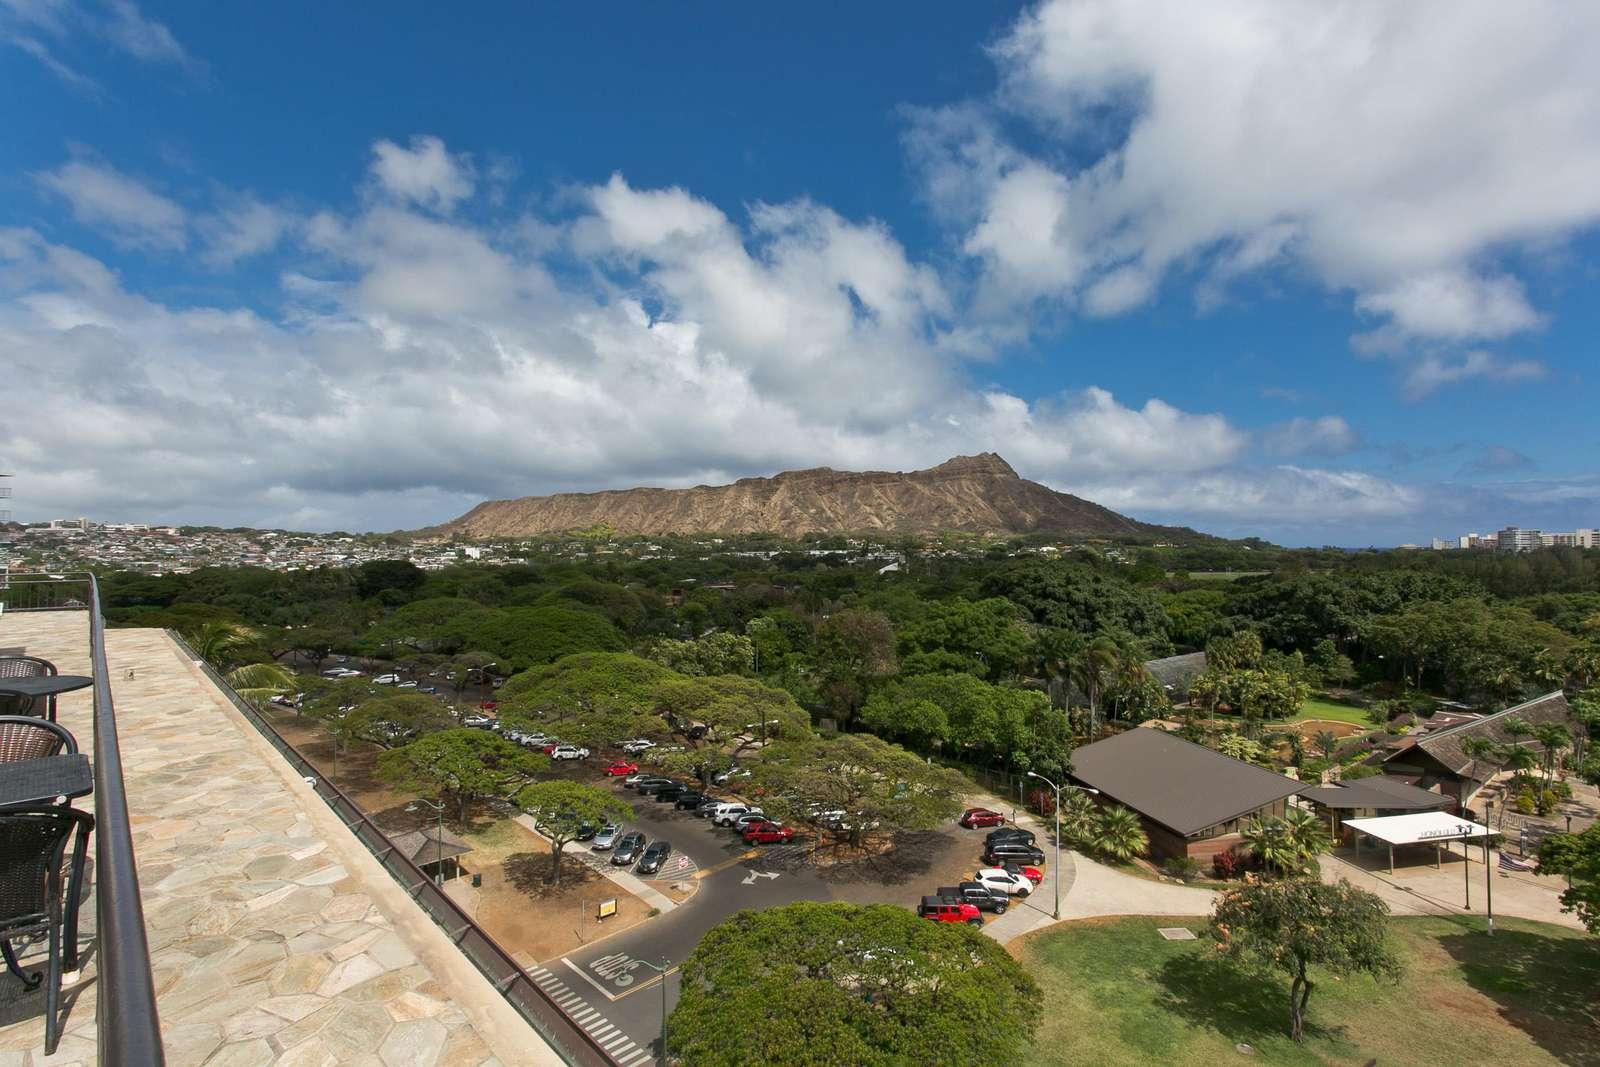 Thats Honolulu Zoo just ahead of us.